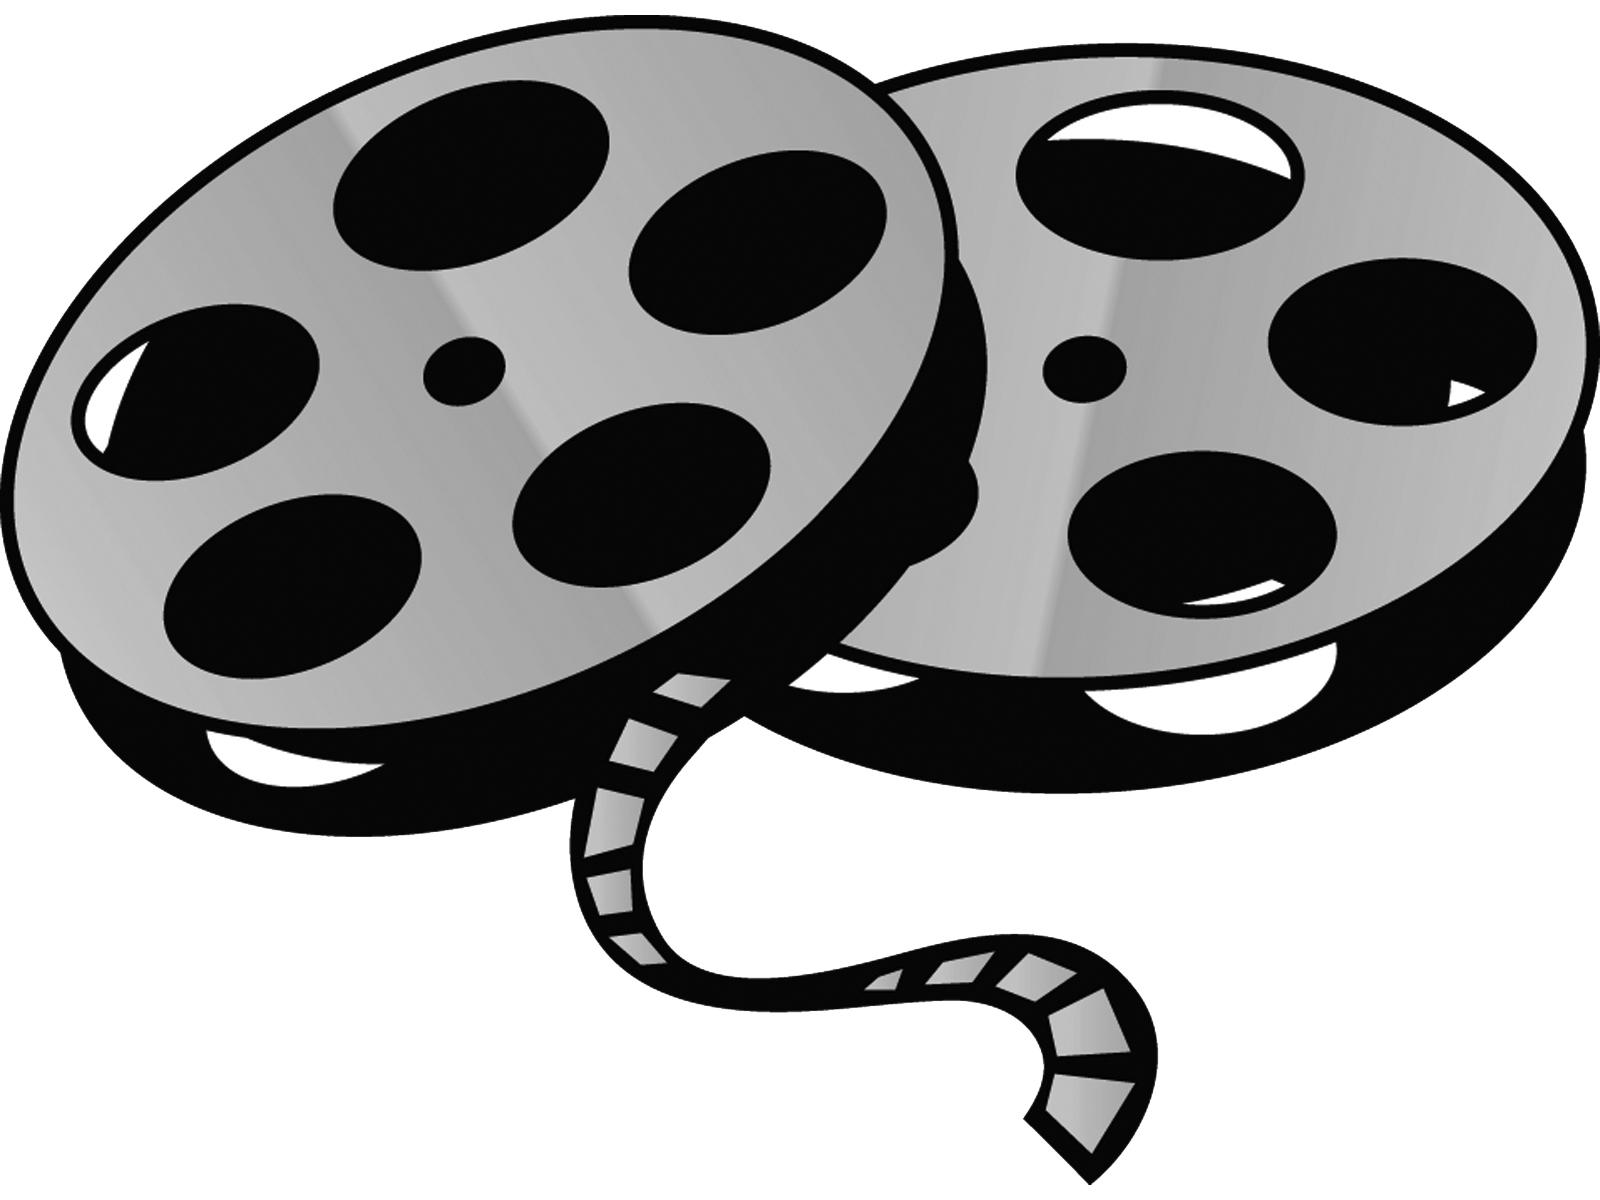 Movie reel movie film reel clip art clipart free download.